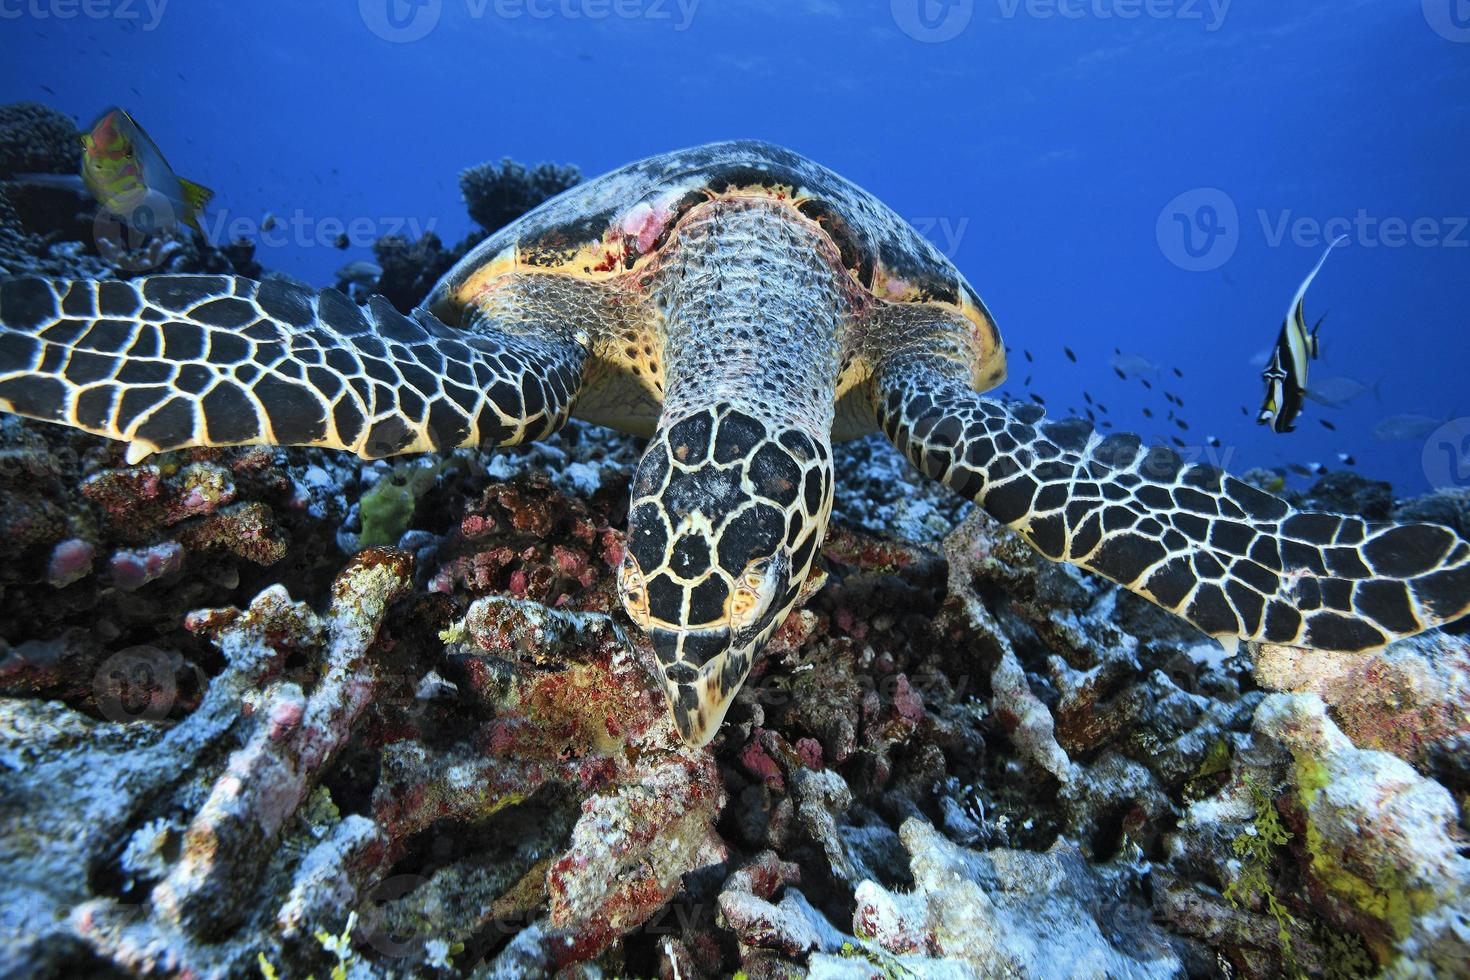 tartaruga-de-pente / erethmochelys imricata foto